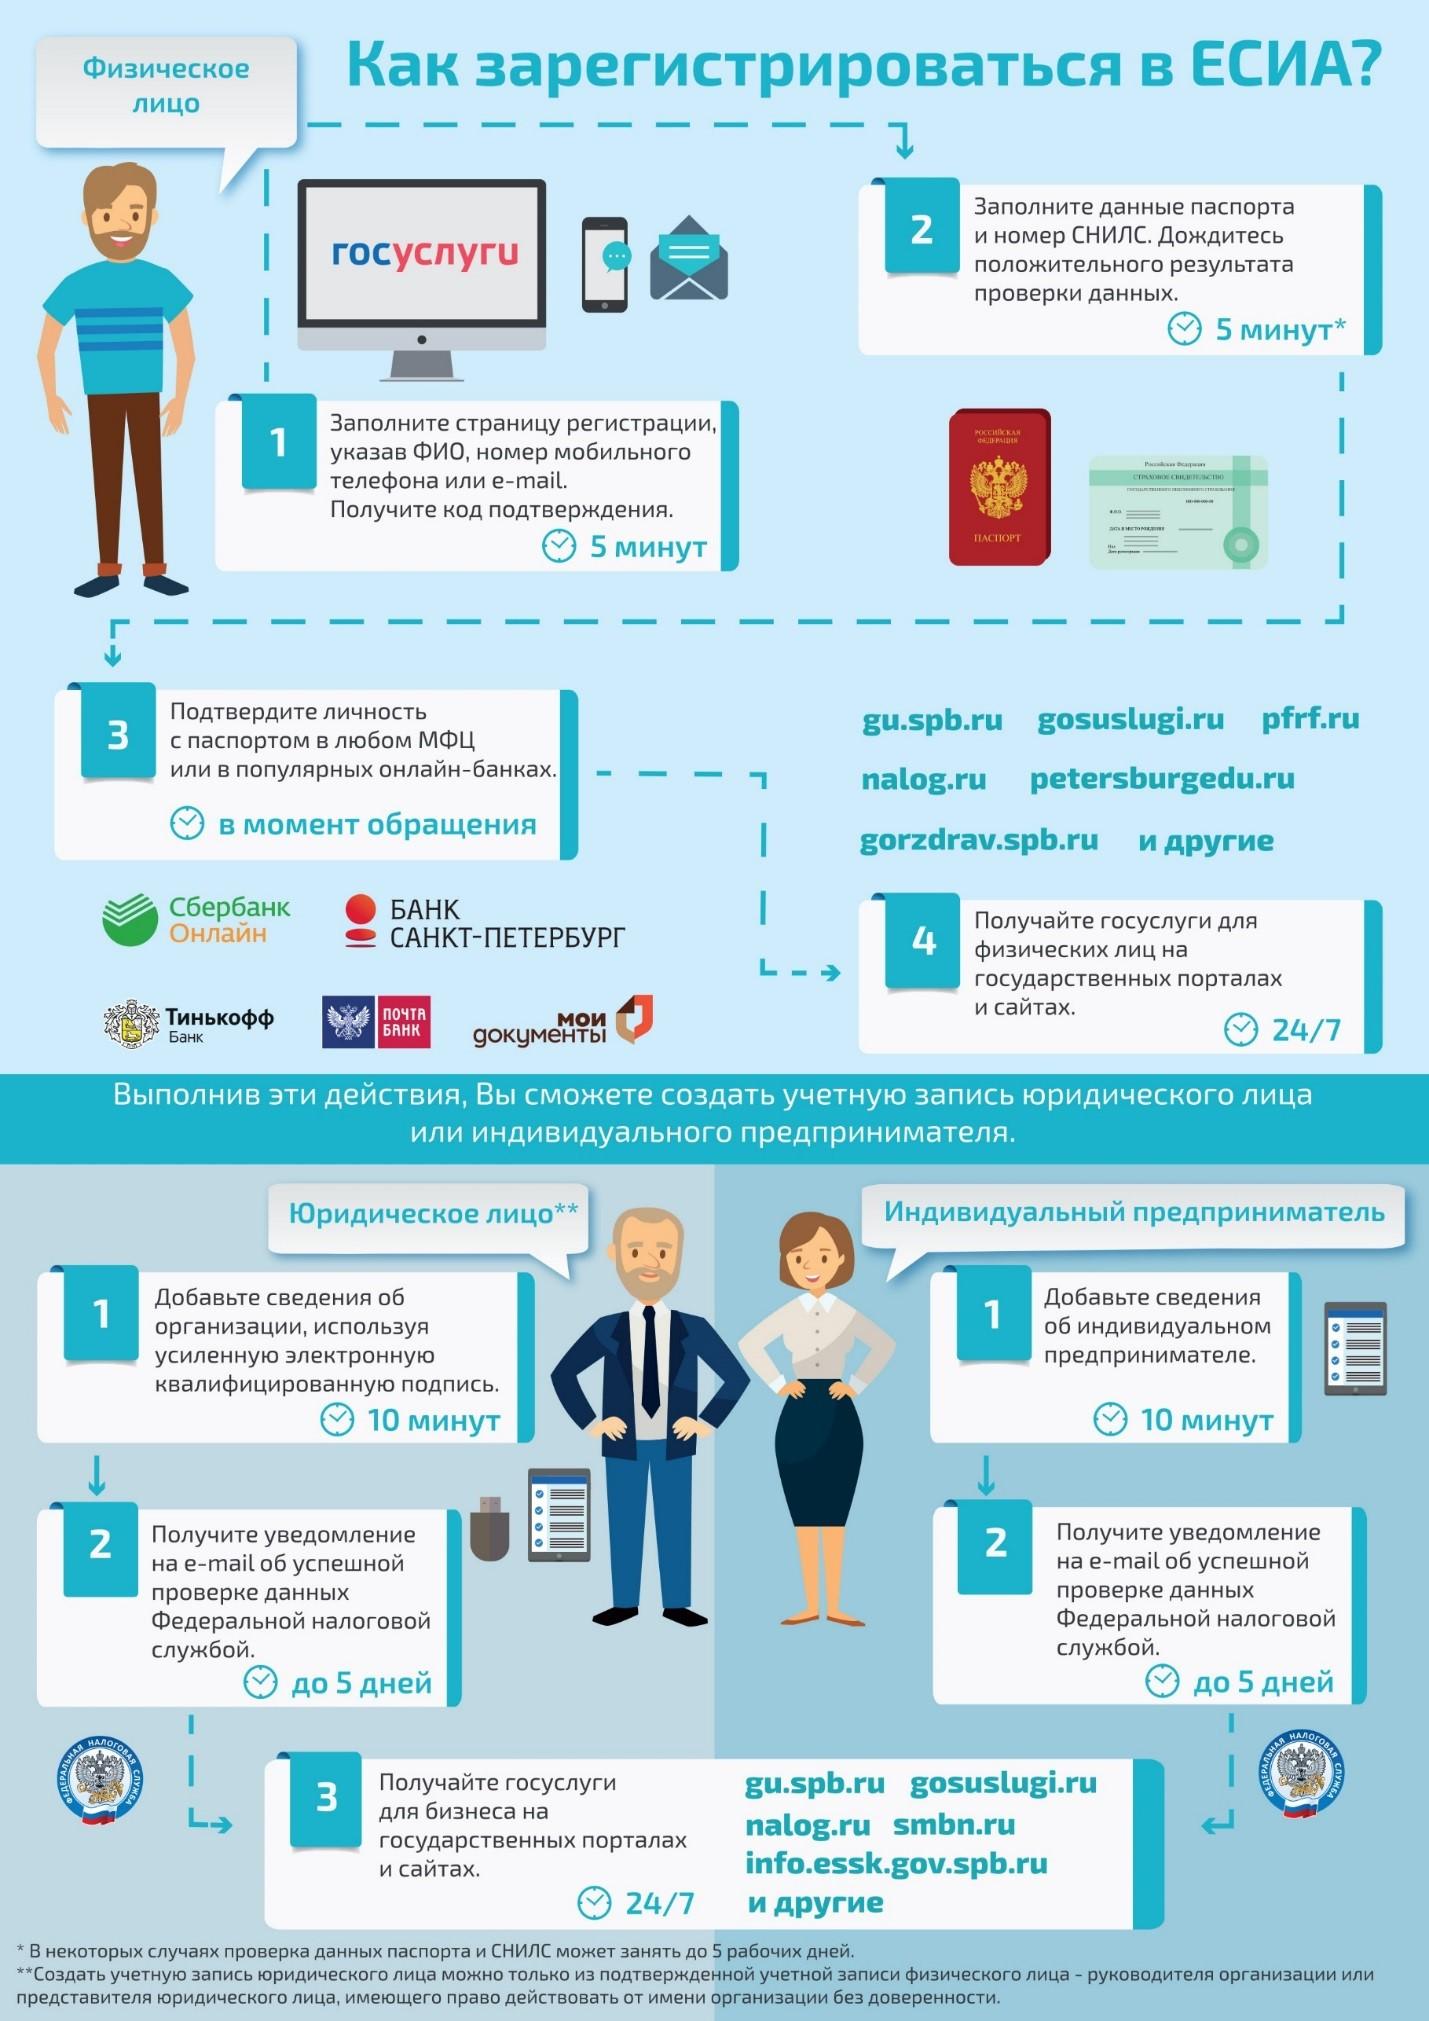 Загранпаспорт в москве по интернету